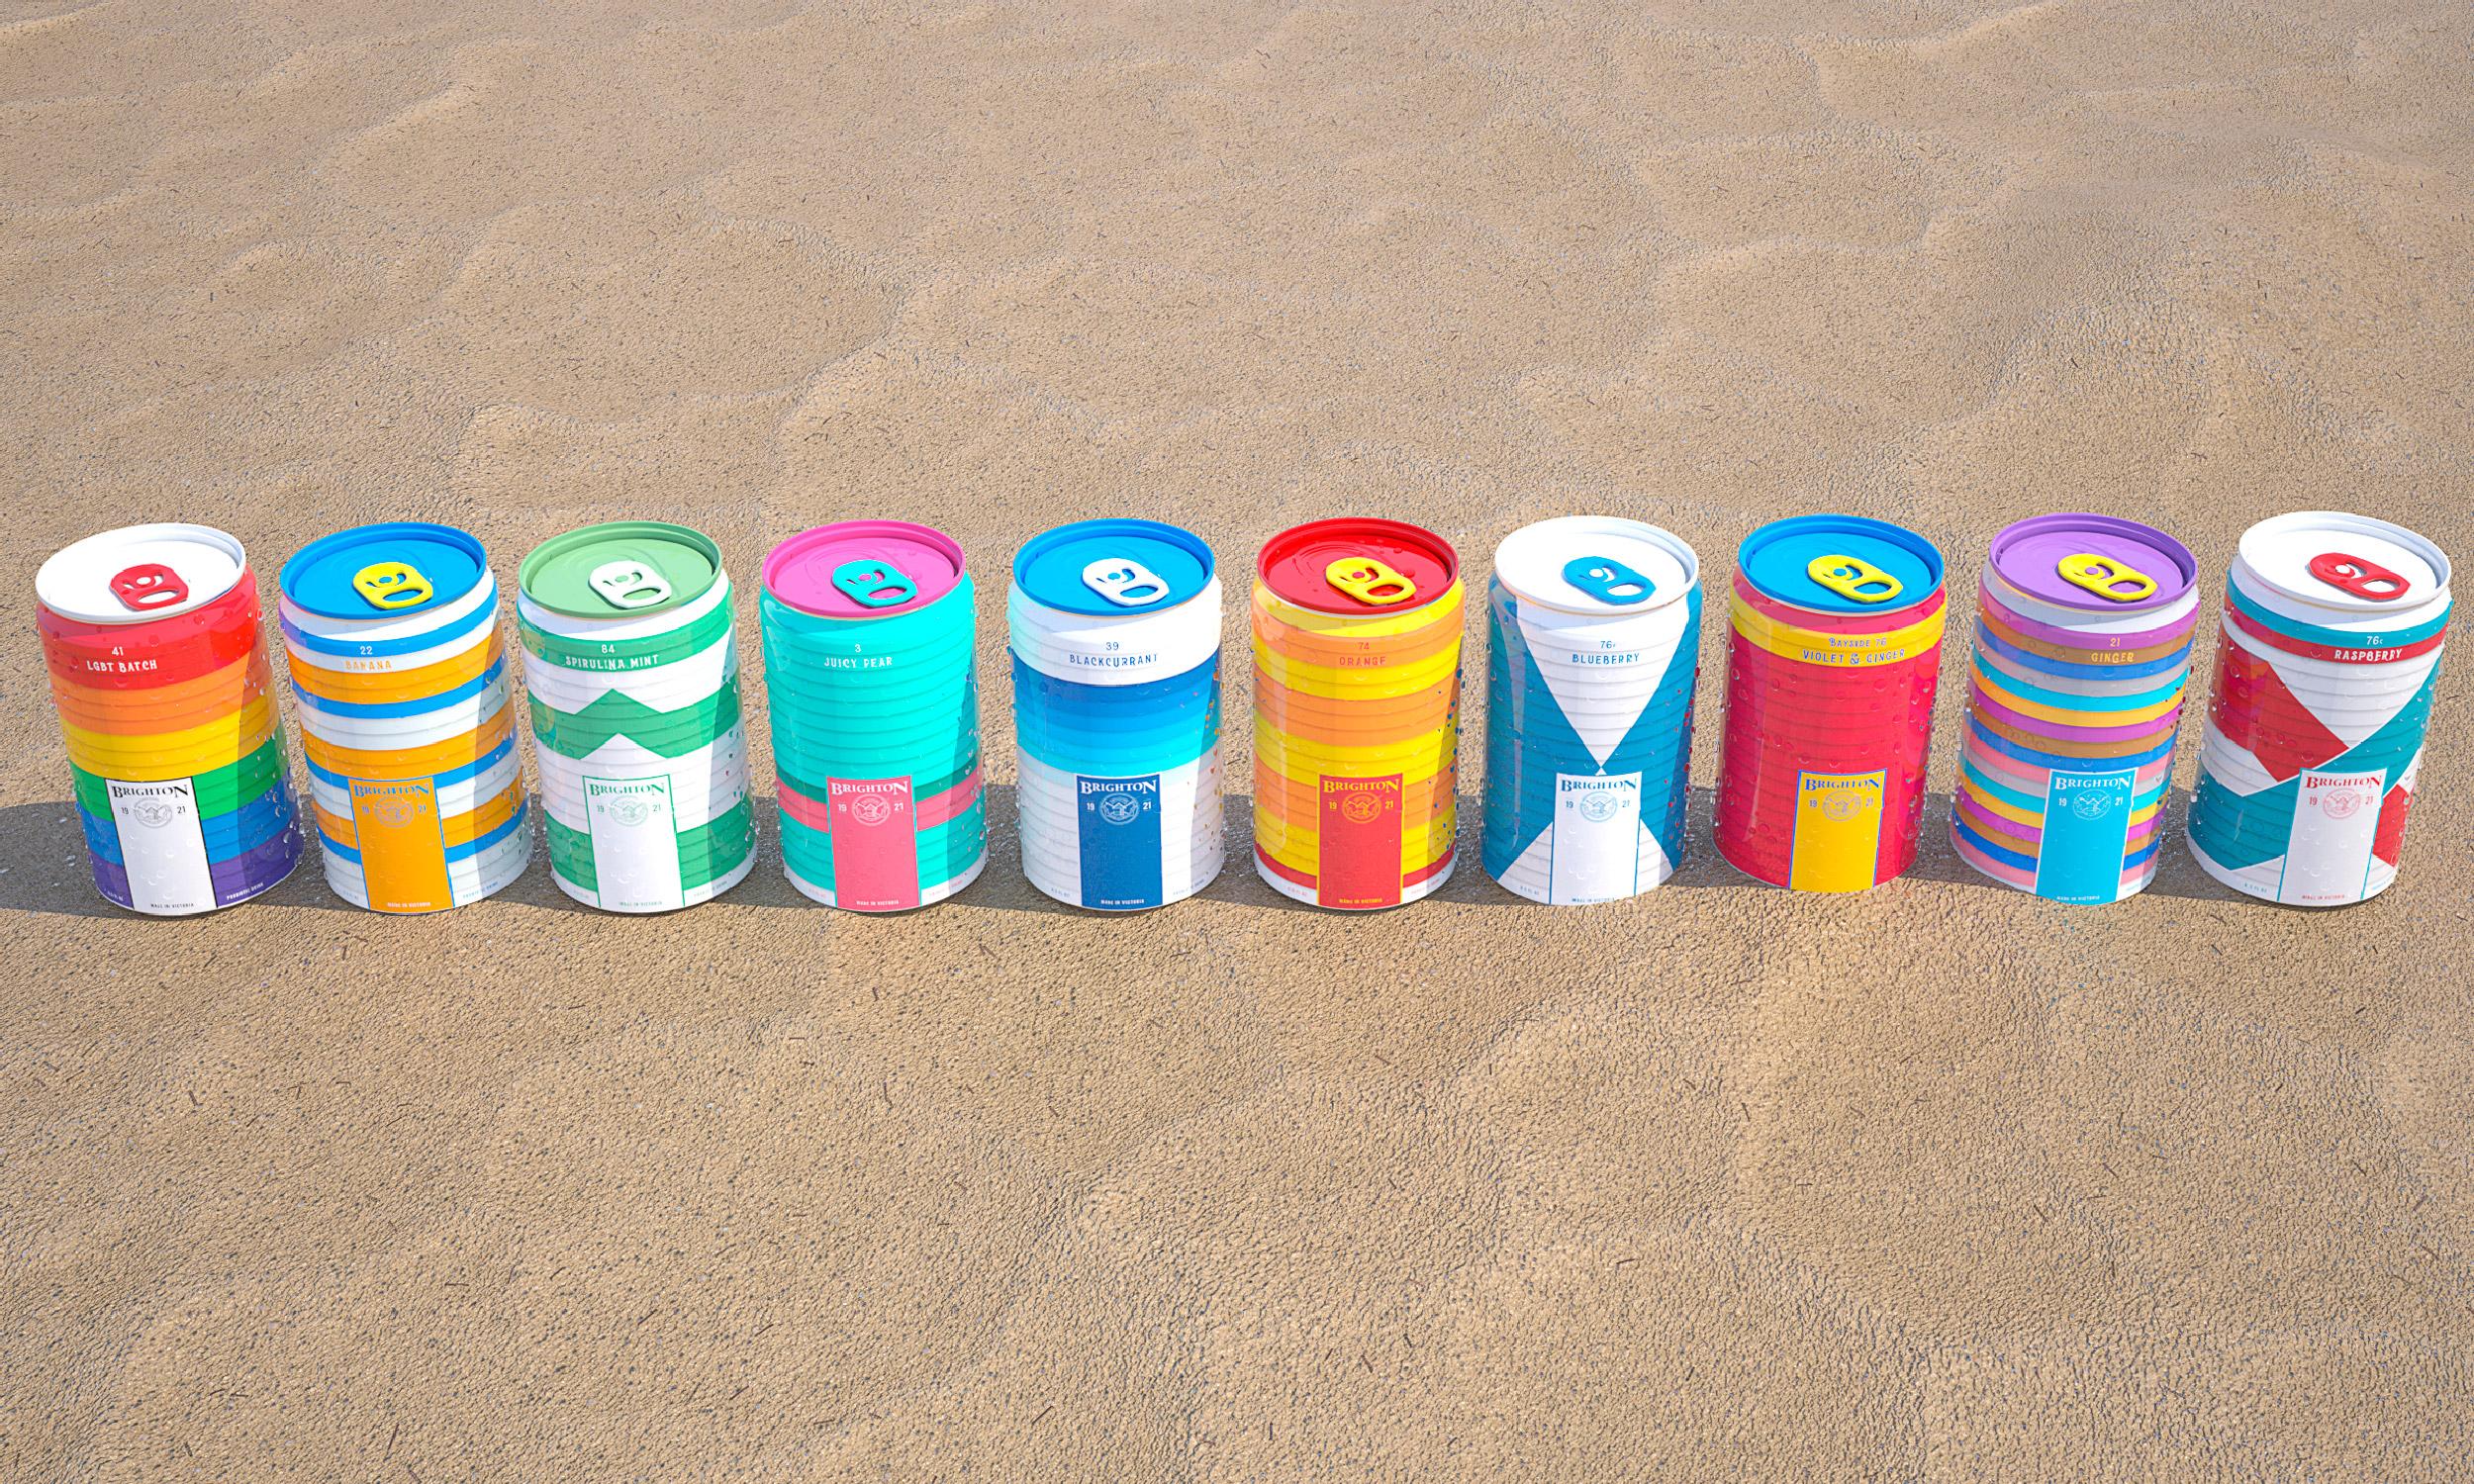 Full Brighton Soda range